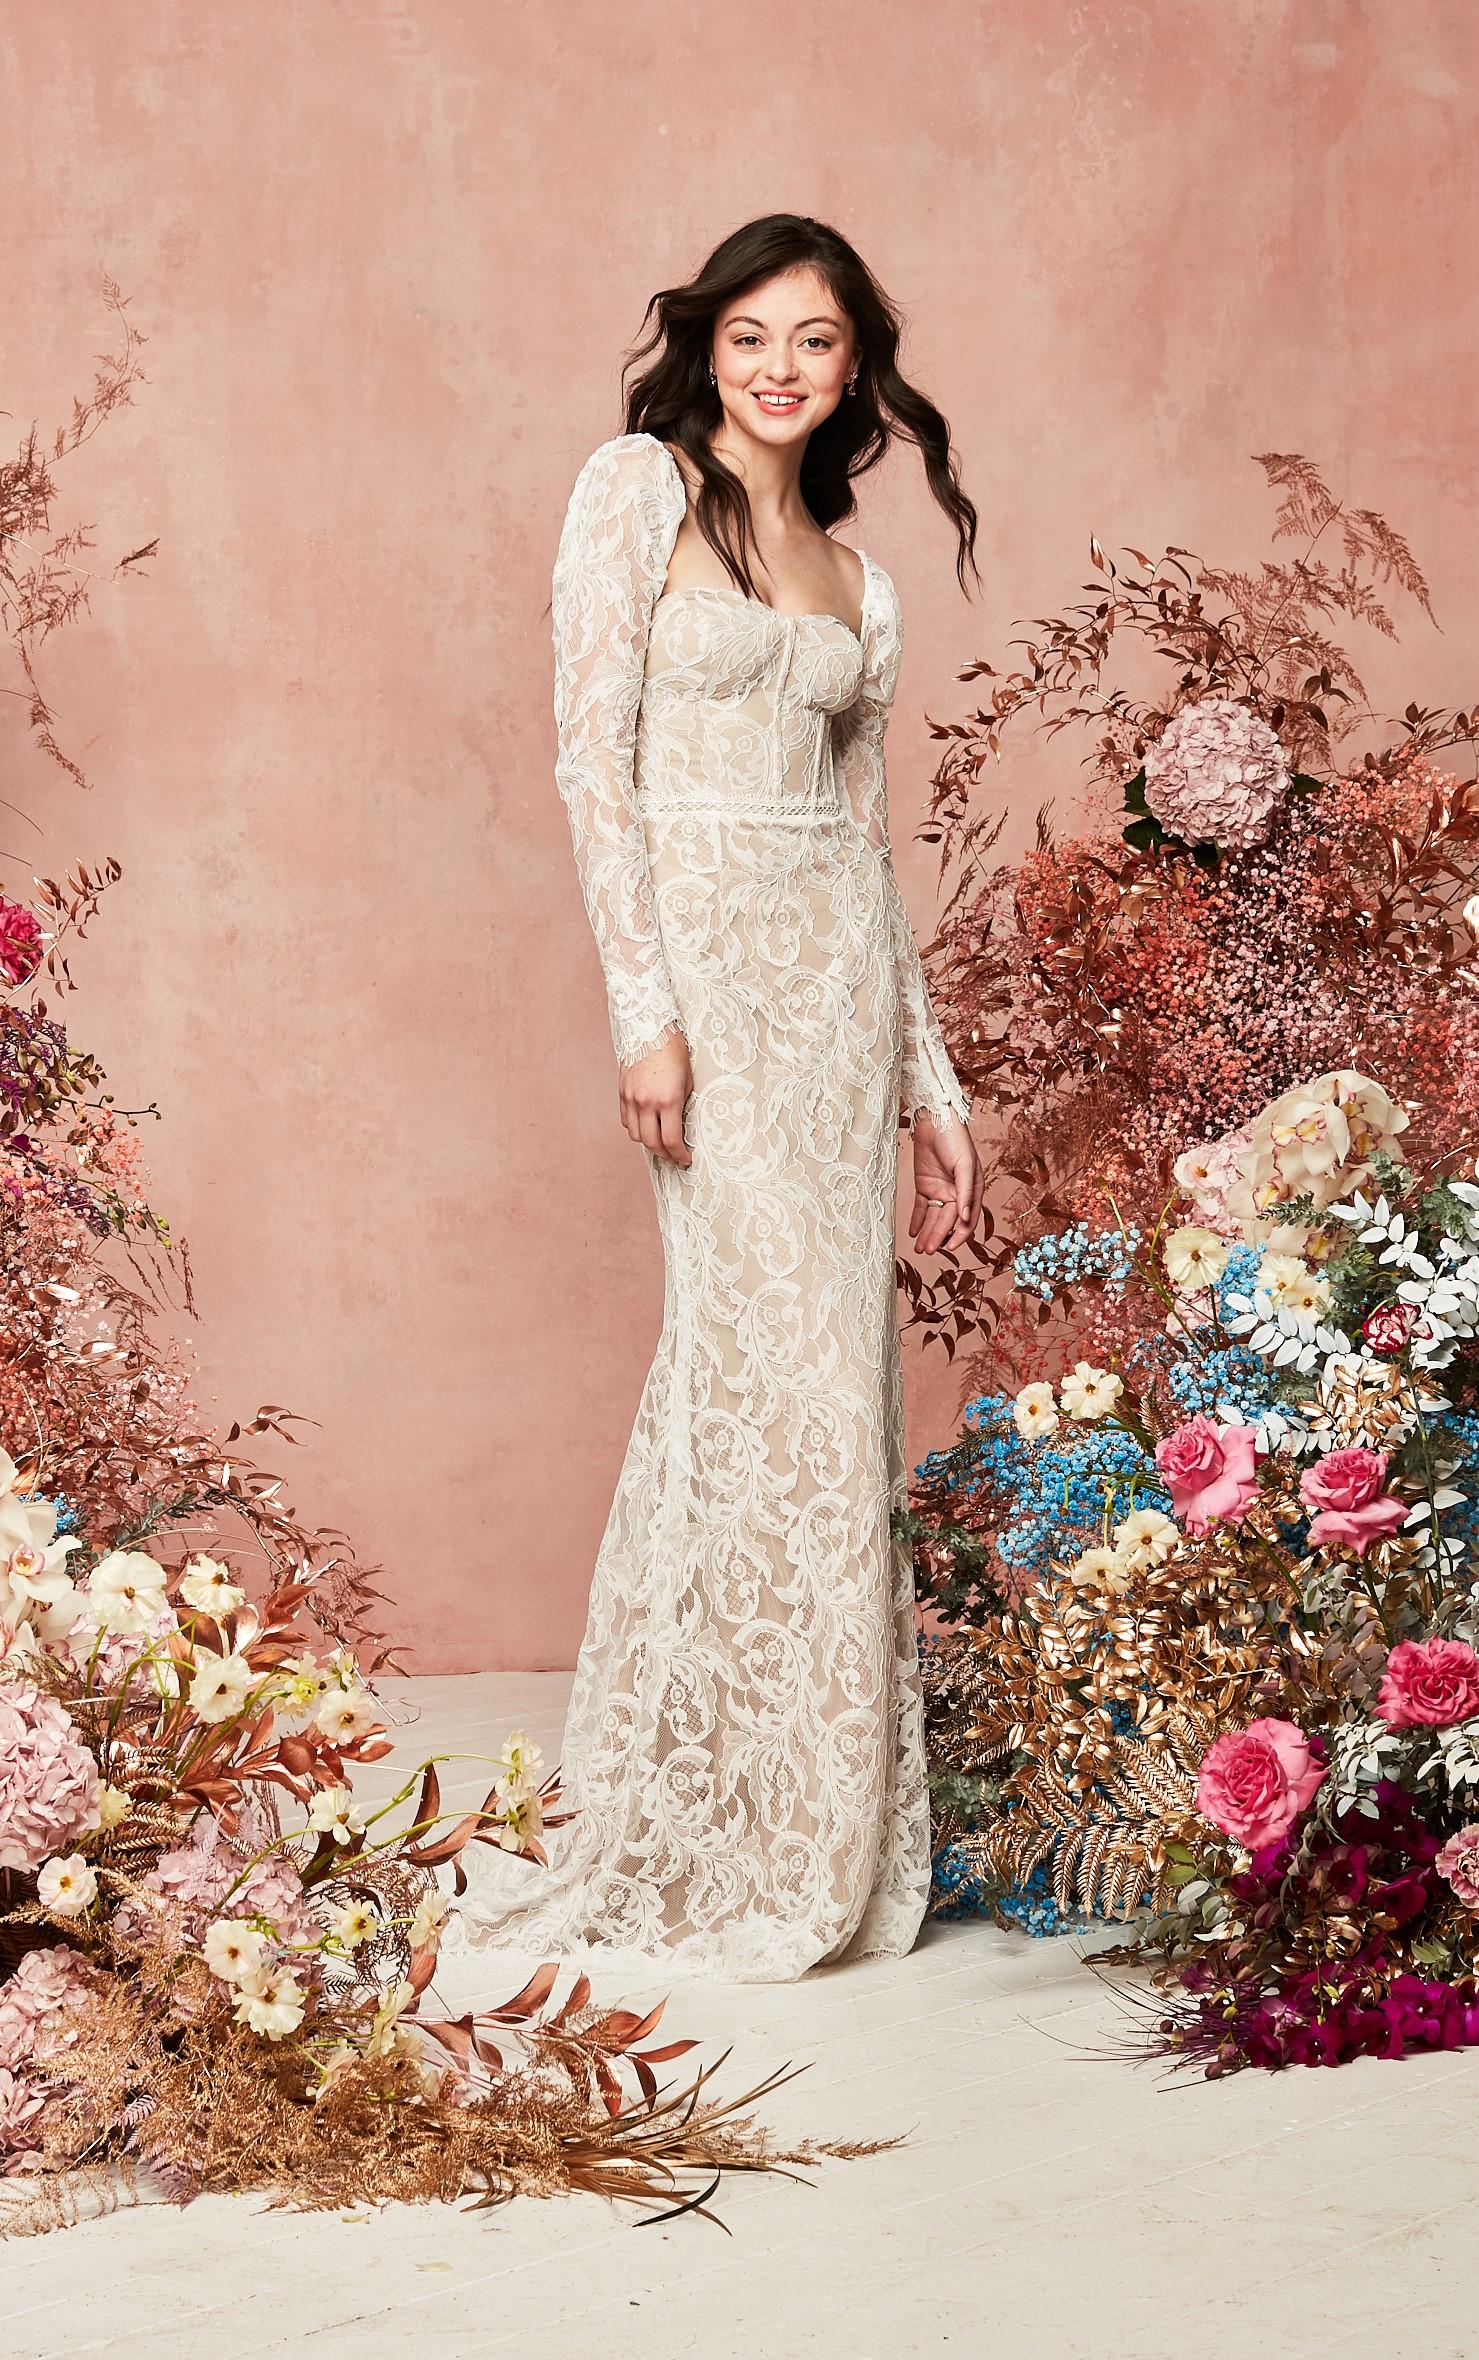 Detachable Sleeves Lace Sheath Wedding Dress david's bridal spring 2021 collection